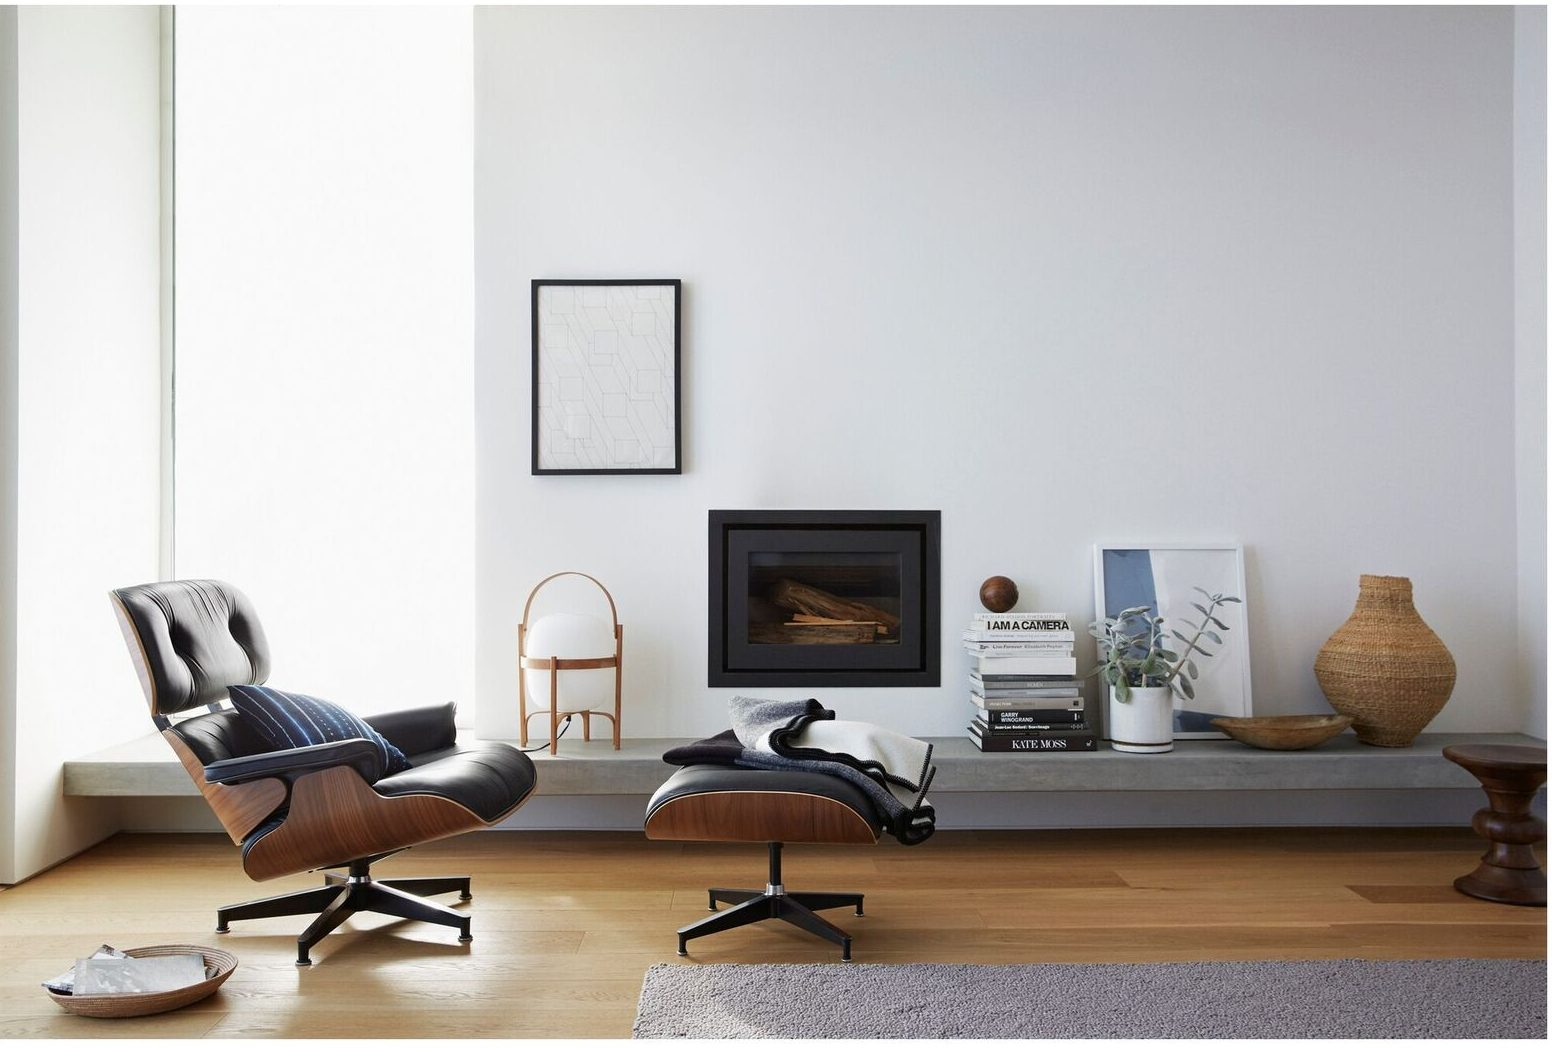 Manhattan home design eames chair review for The house designers reviews